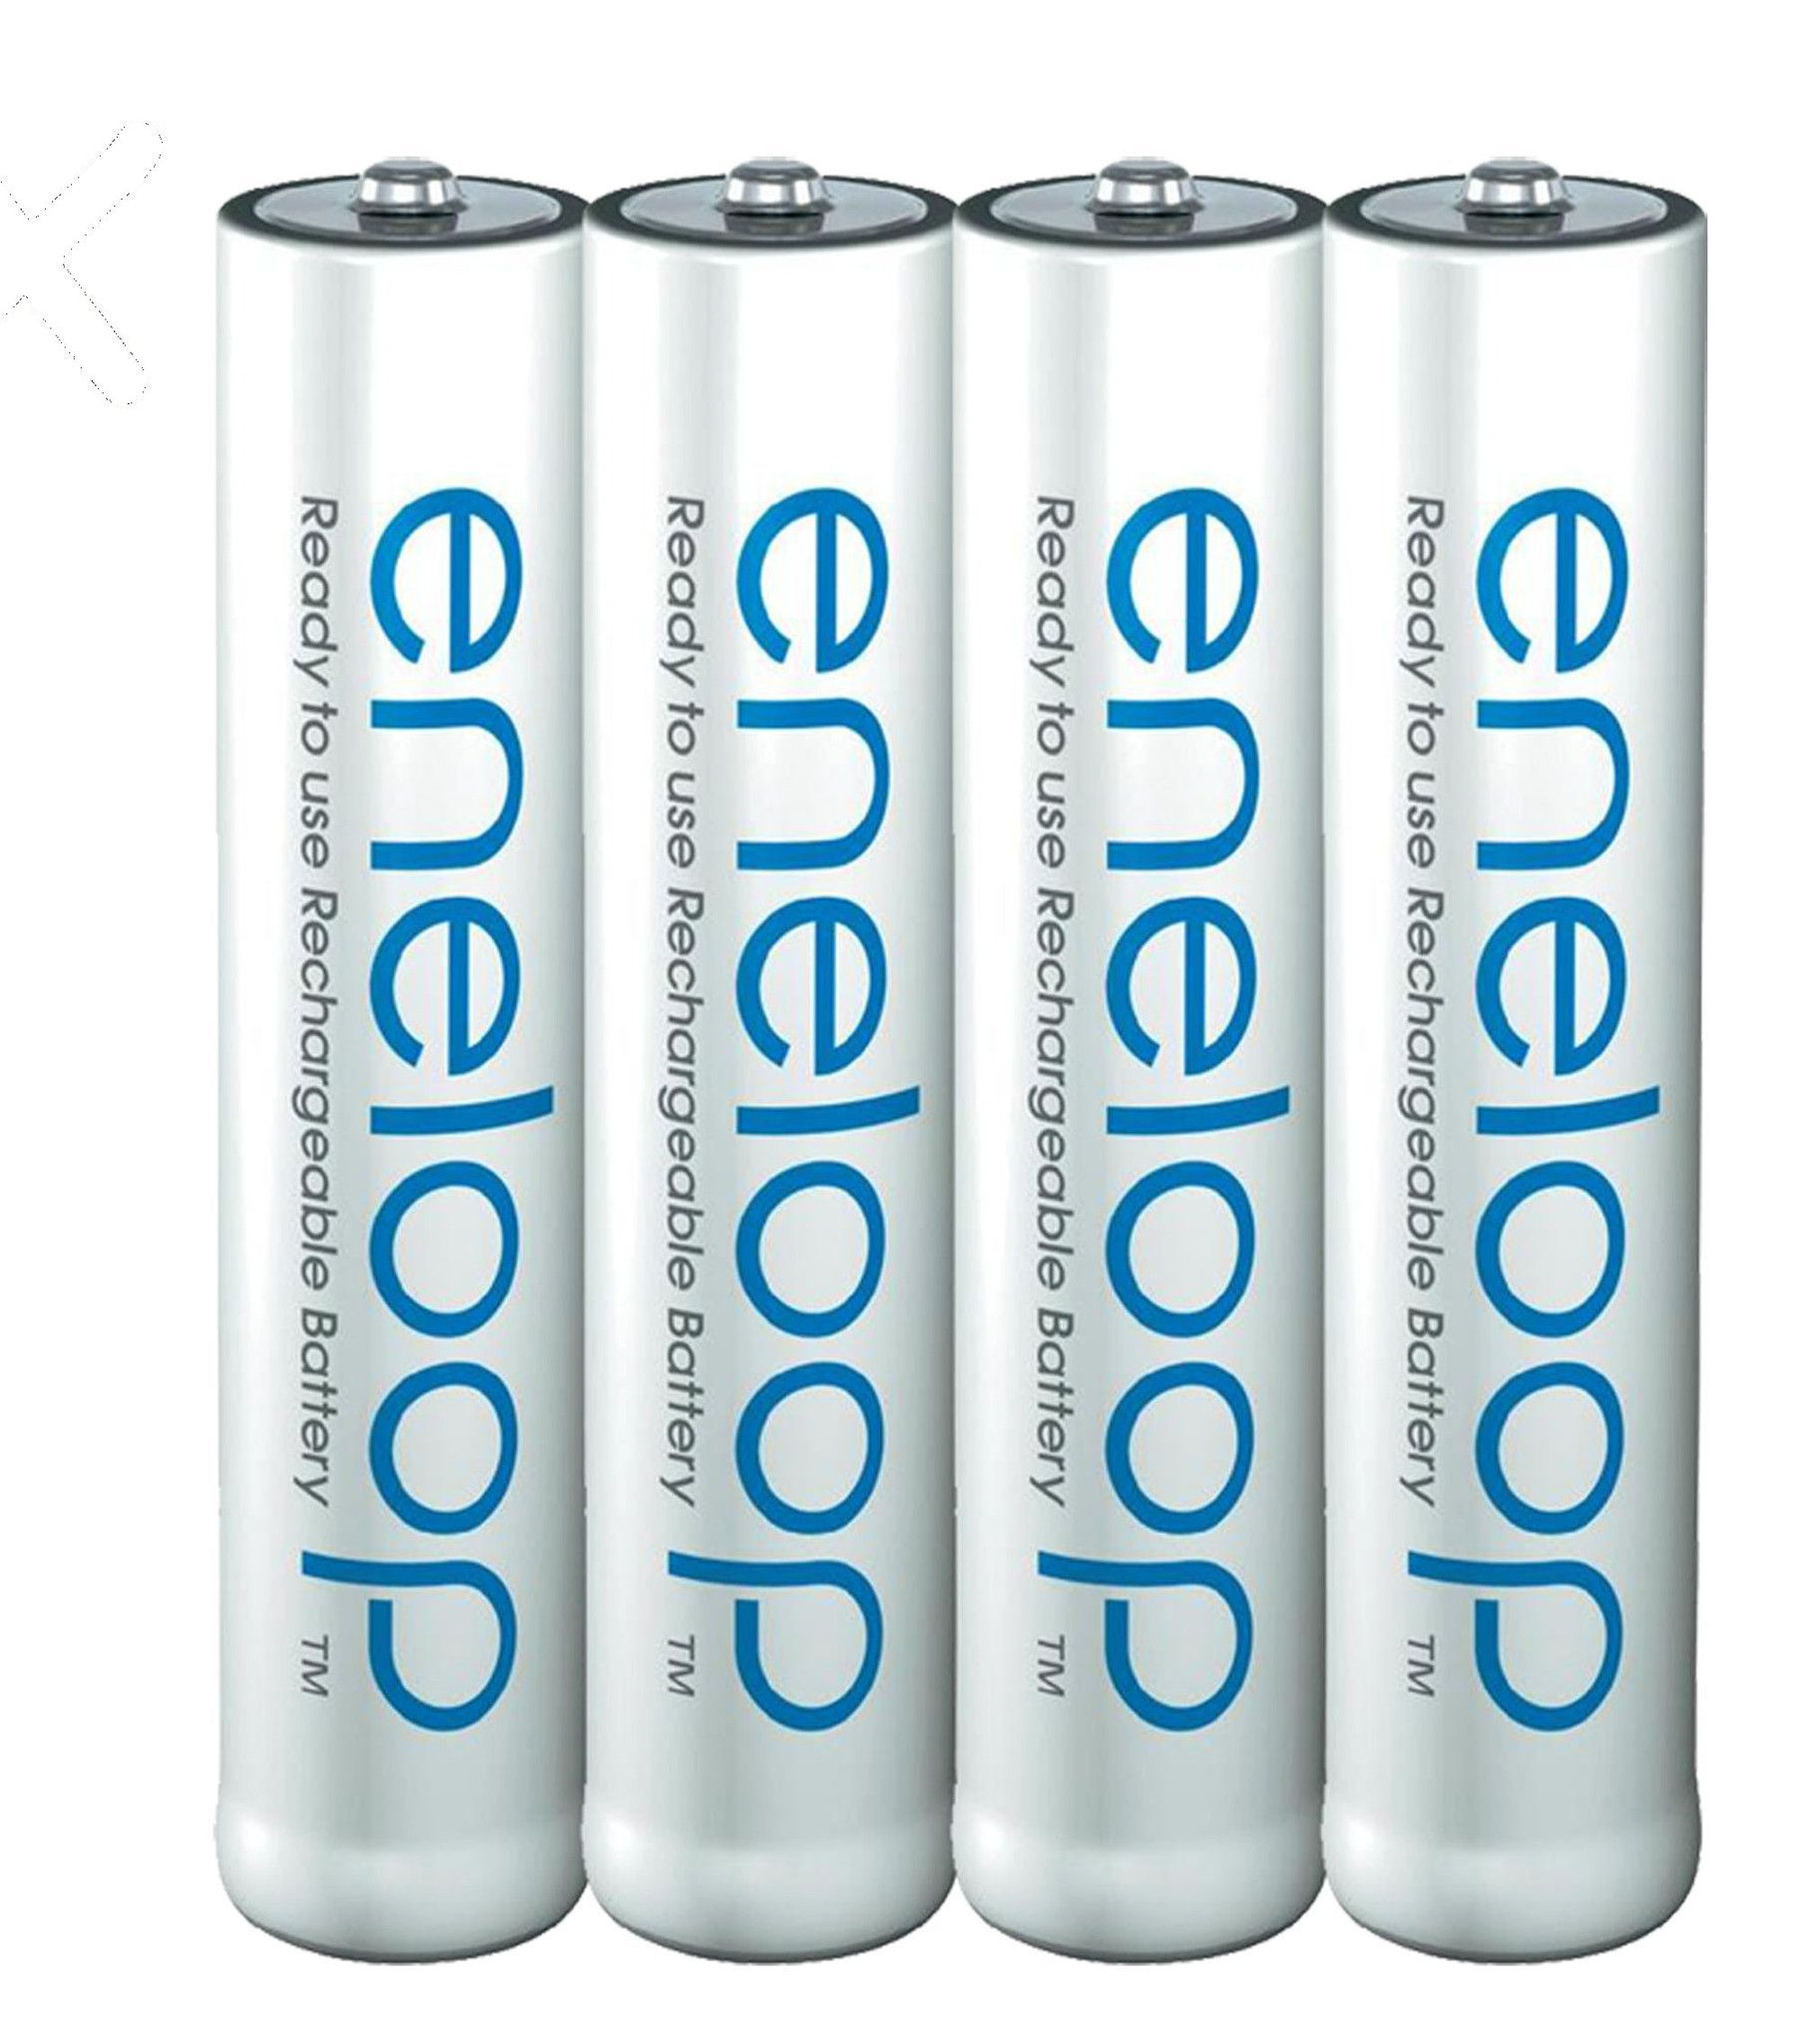 Amazon Com Panasonic Bk 3mcca8ba Eneloop Aa 2100 Cycle Ni Mh Pre Charged Rechargeable Batteries 8 Pack Bk 4mcca4ba Eneloop Aaa 2100 Cycle Ni Mh Pre Charged Rechargeable Batteries 4 Pack Electronics